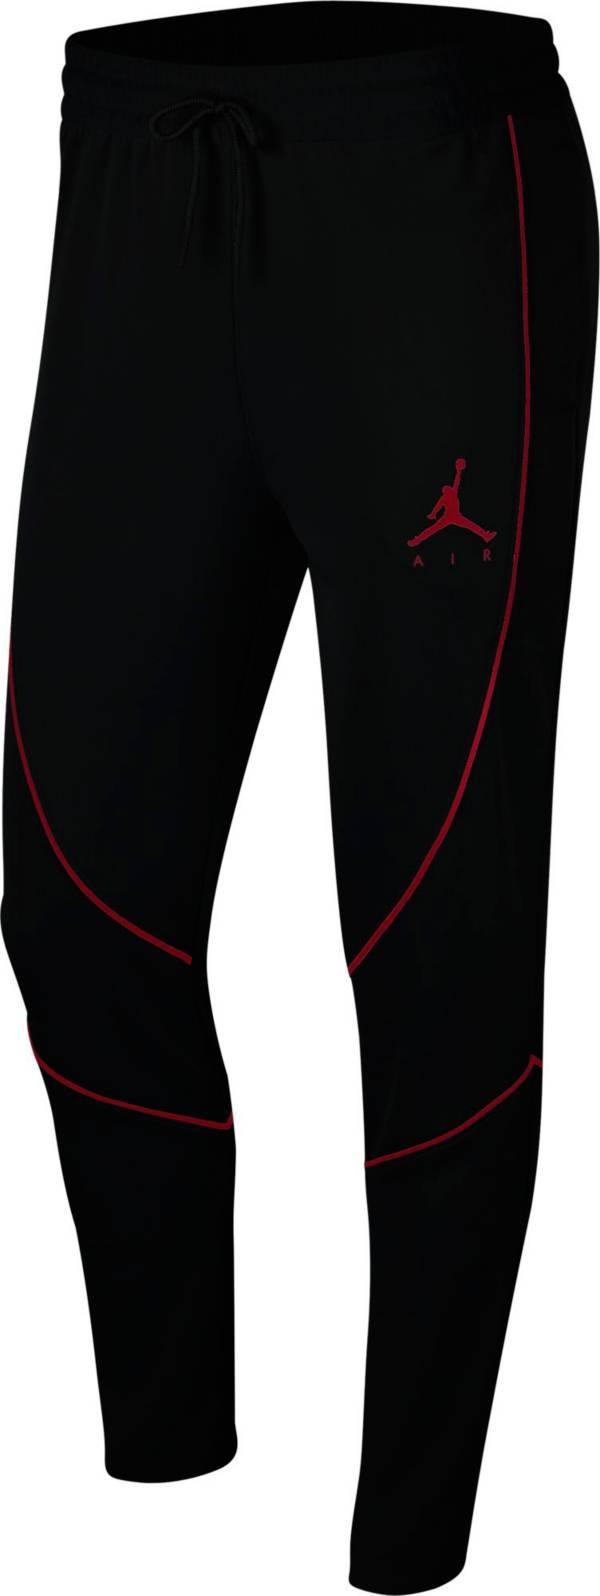 Jordan Men's Jumpman Air Suit Pants product image